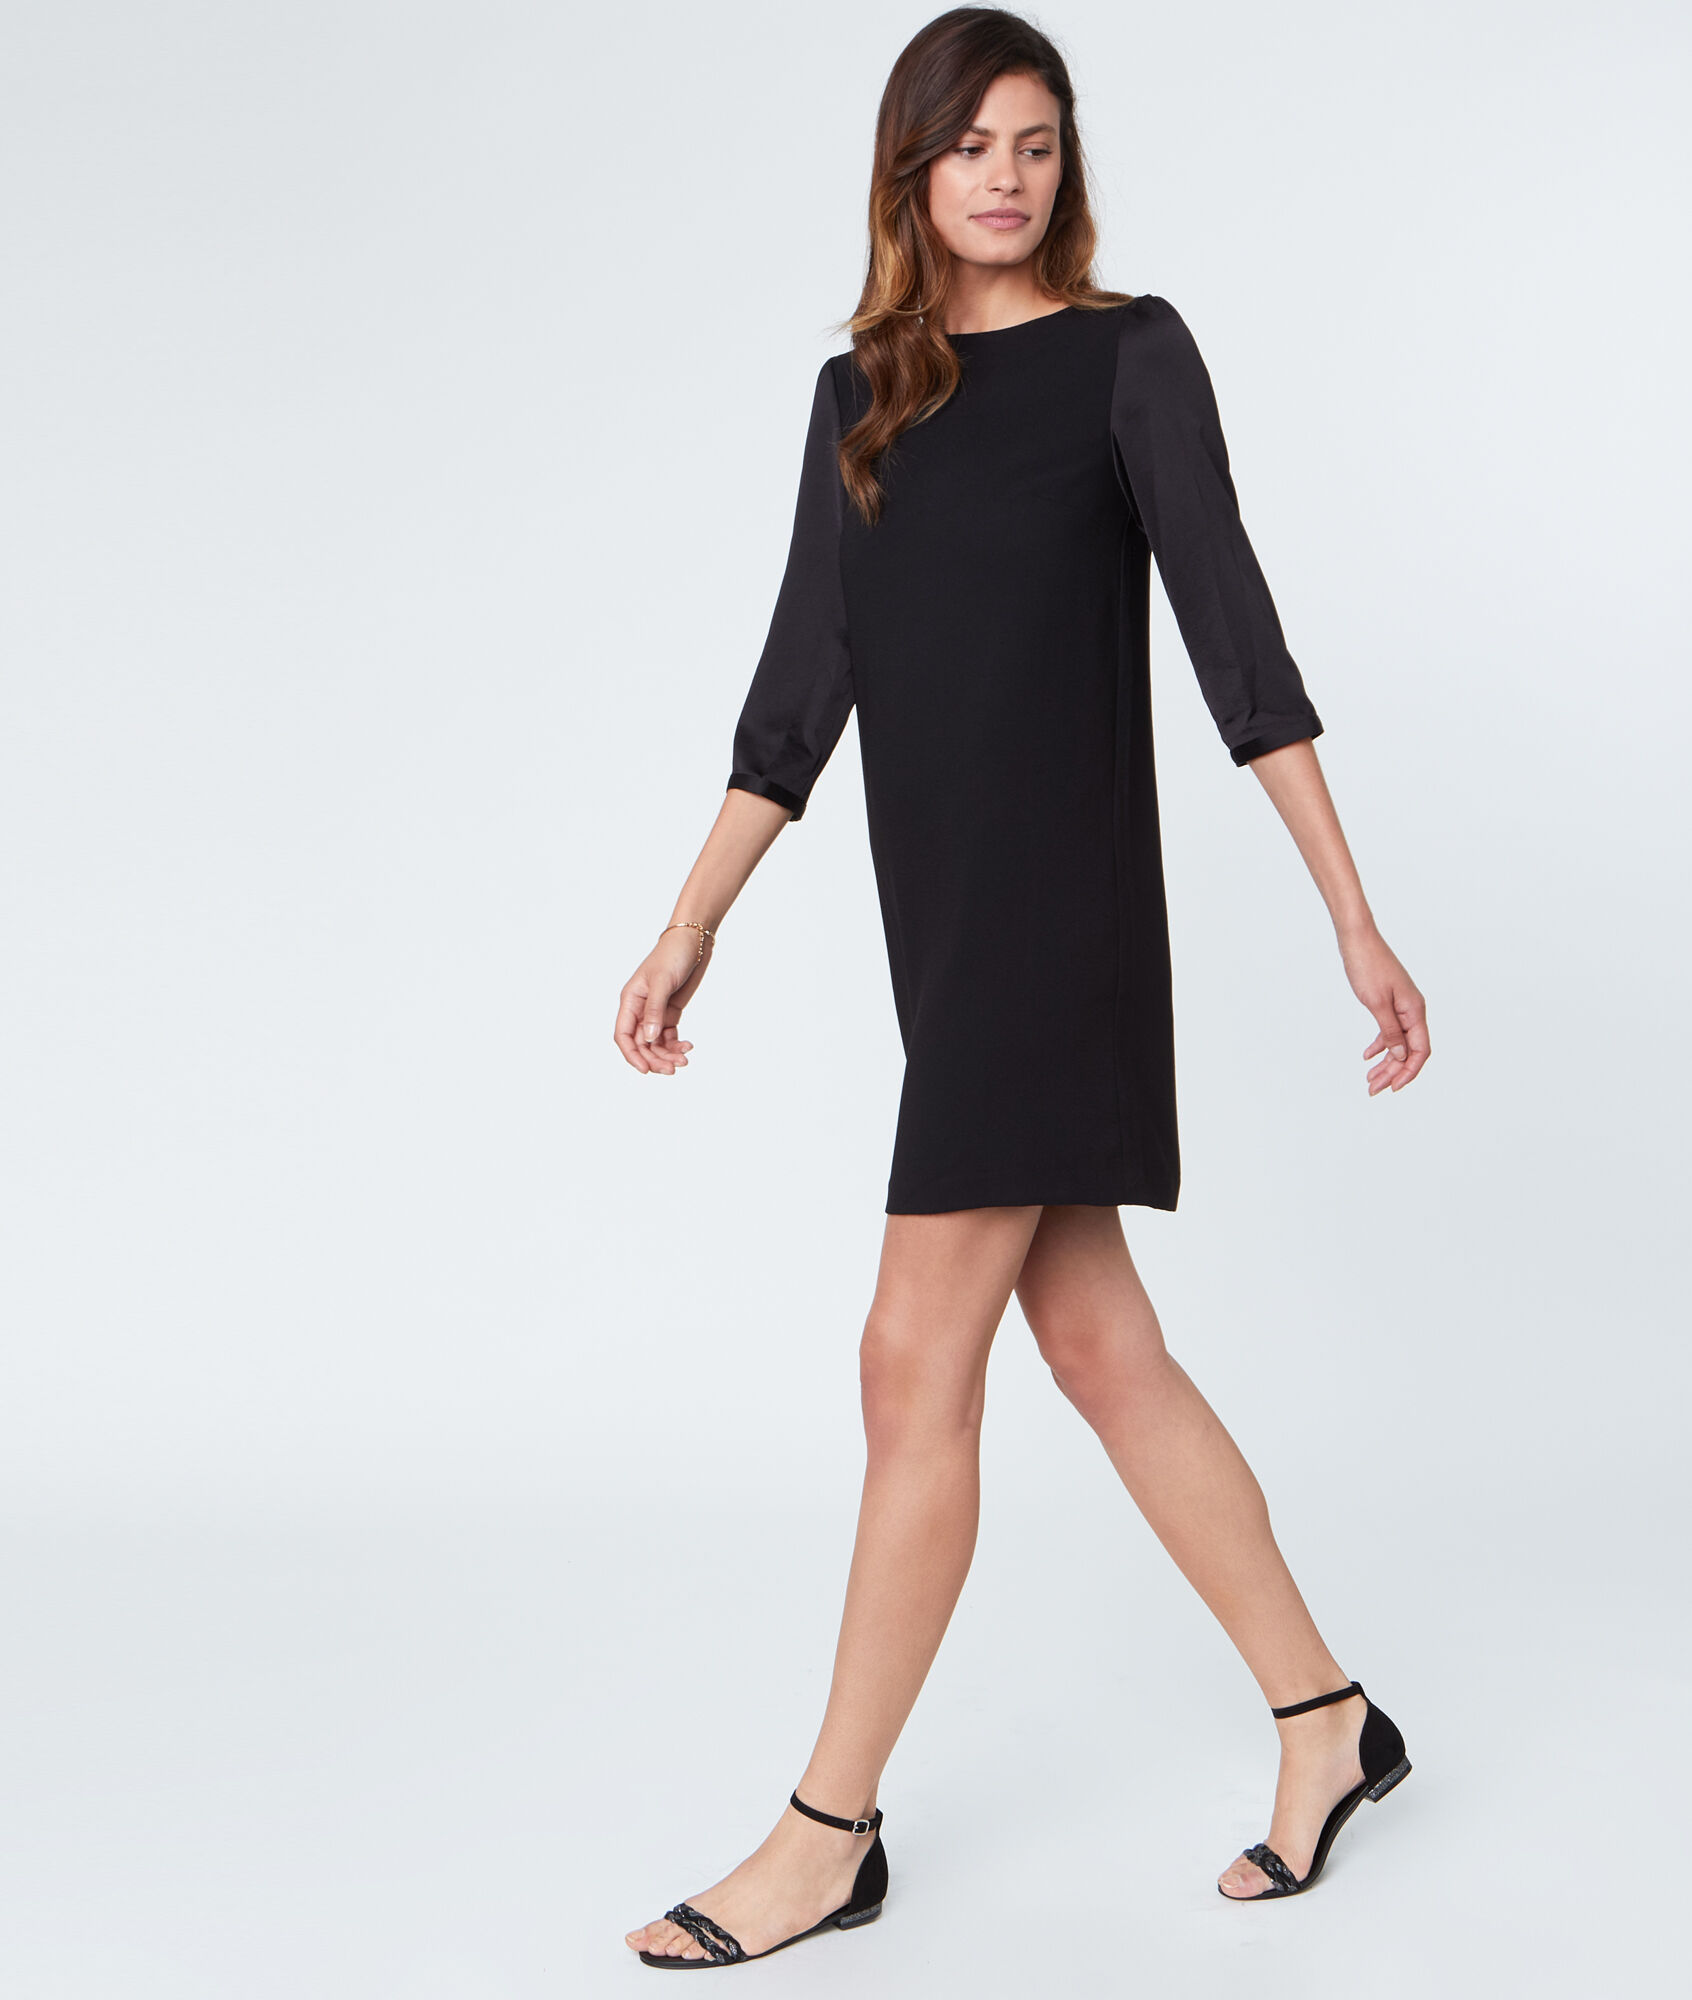 robe noire manches 3 4. Black Bedroom Furniture Sets. Home Design Ideas